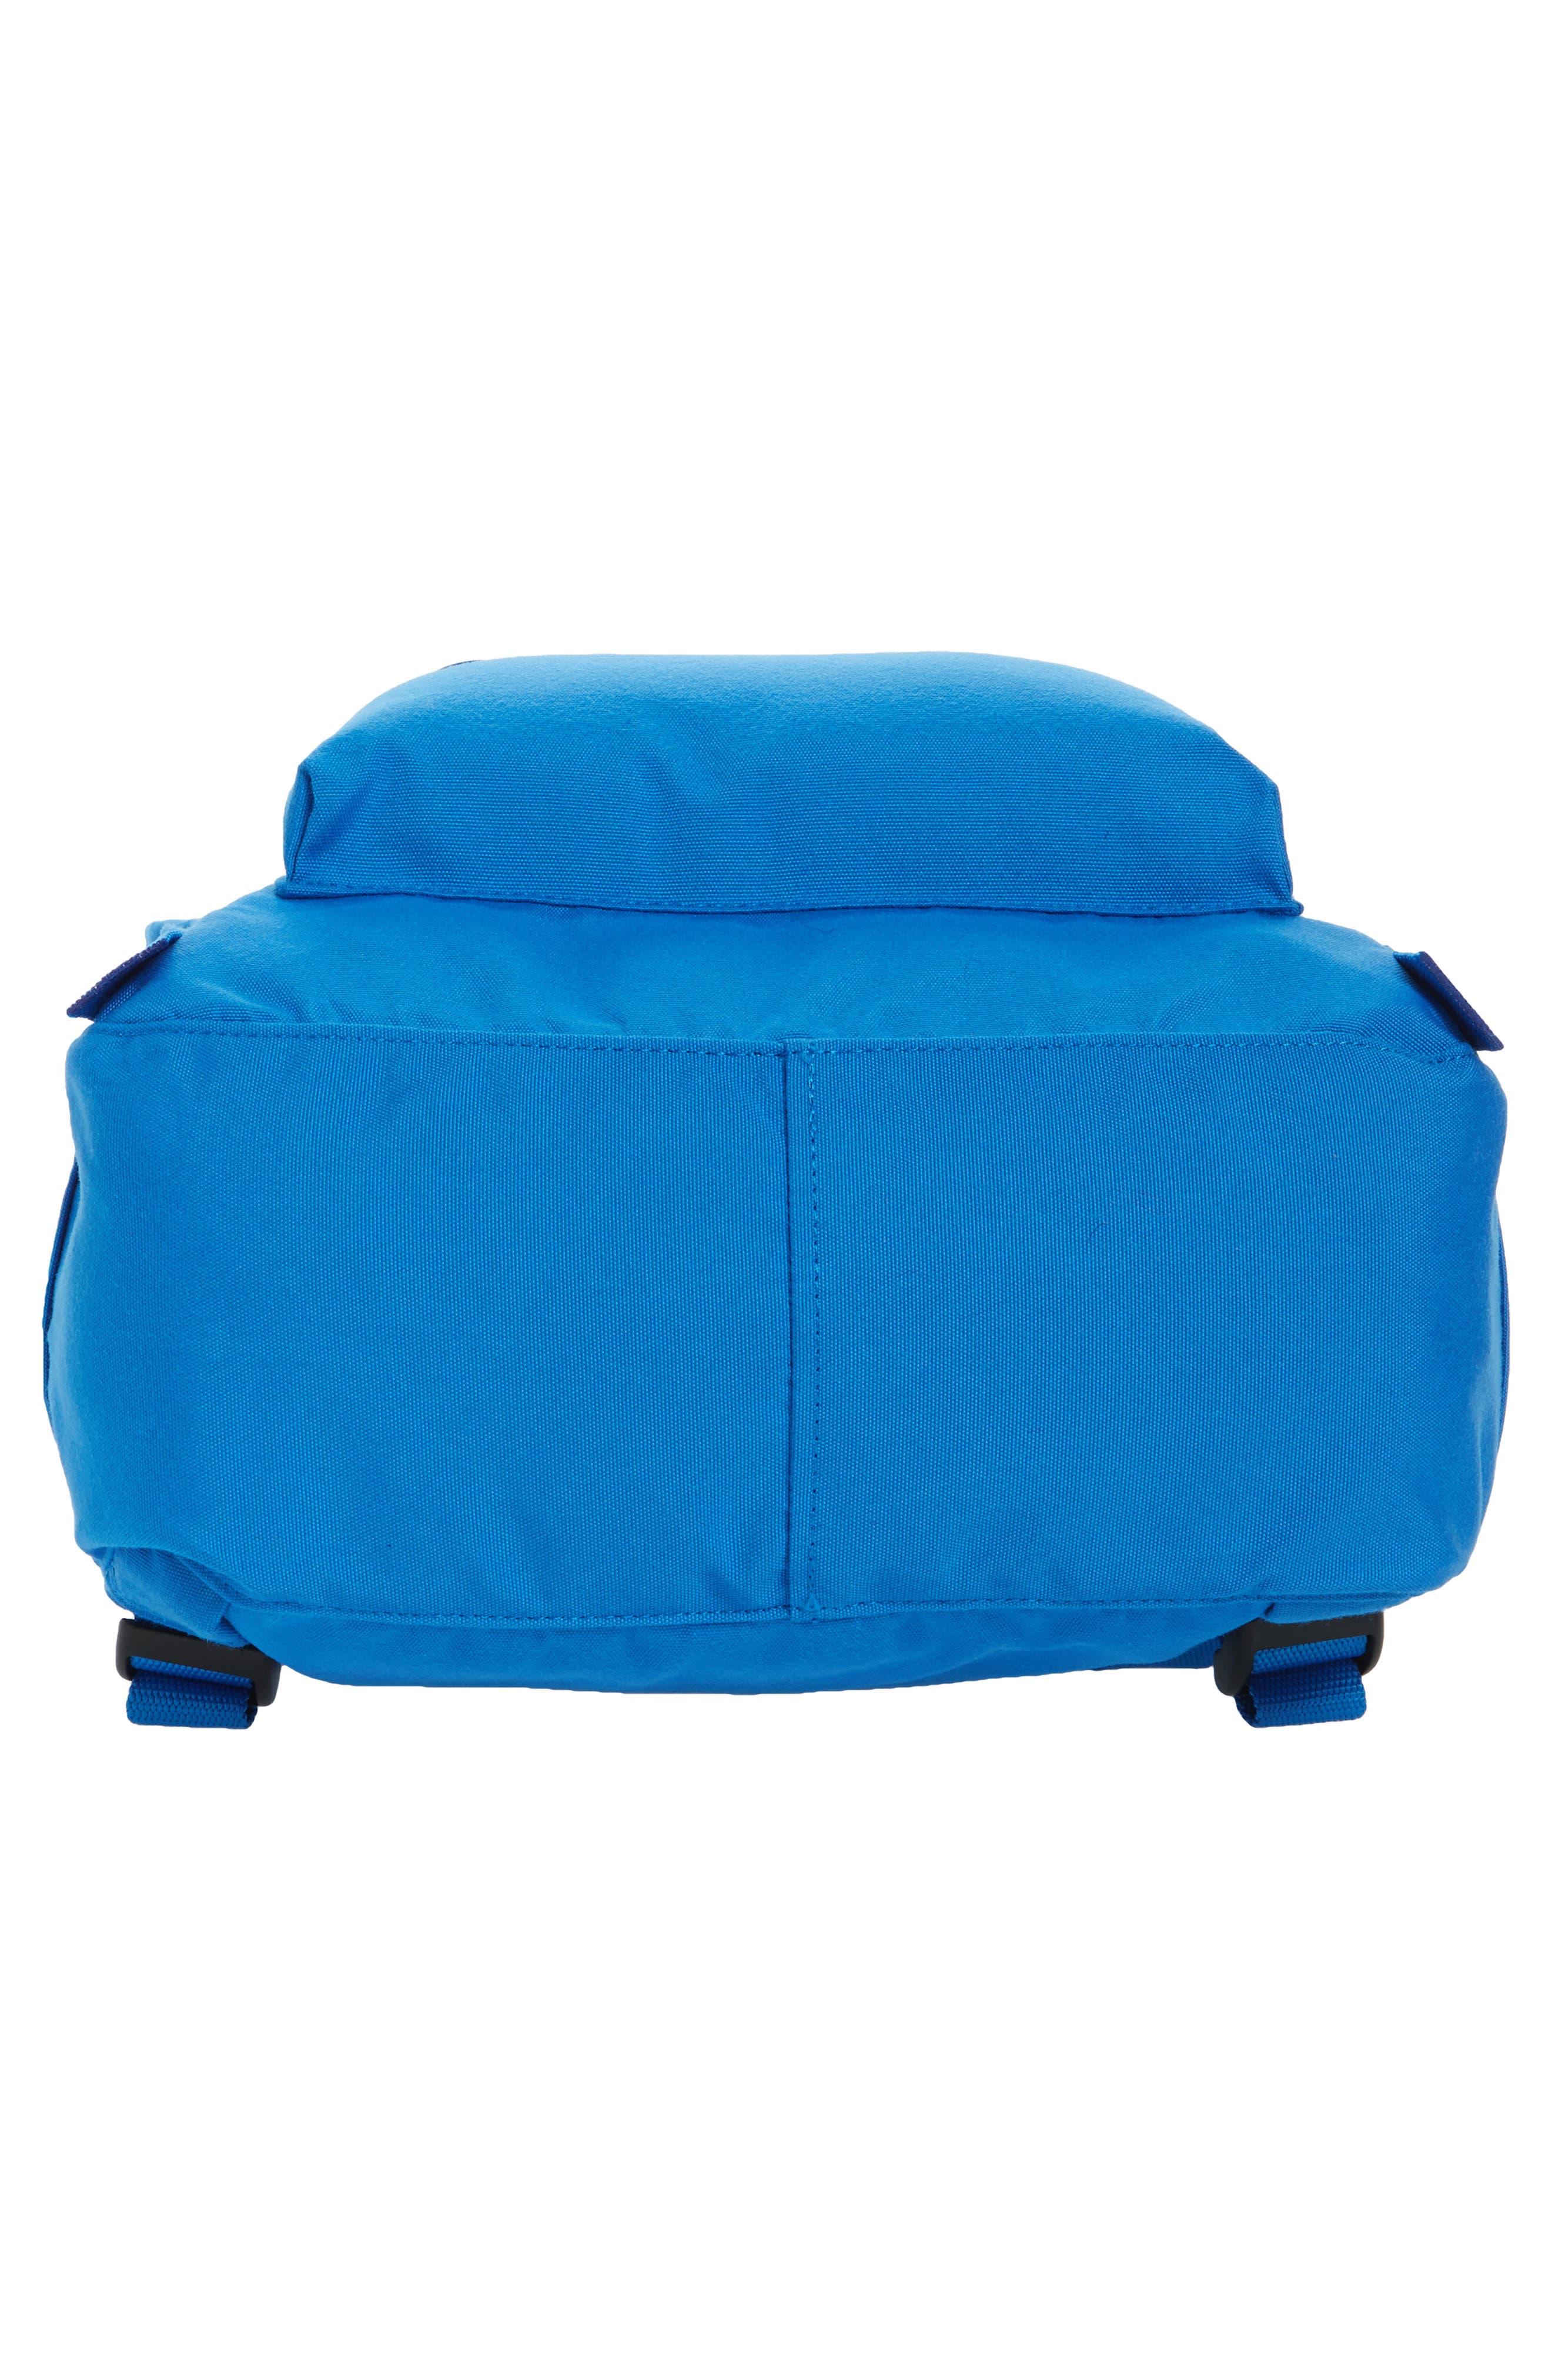 Re-Kånken Water Resistant Backpack,                             Alternate thumbnail 6, color,                             UN BLUE